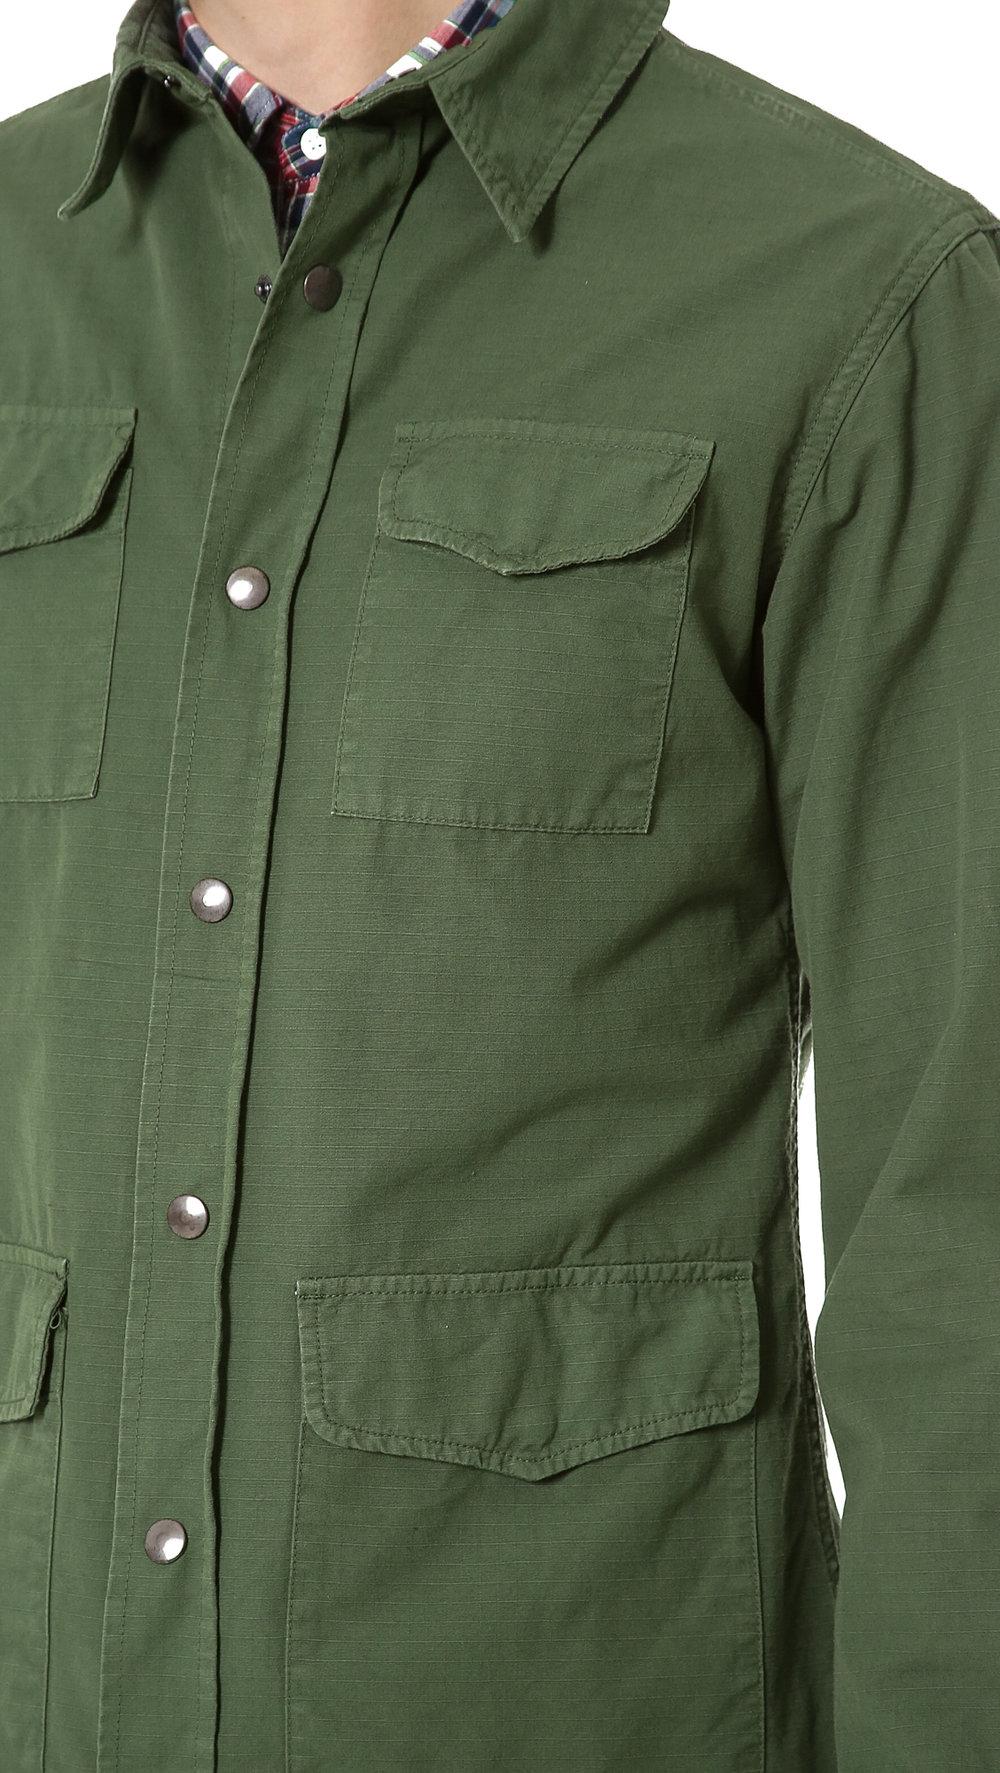 aspesi-green-vietnam-shirt-jacket-product-1-17960831-0-166459795-normal.jpeg